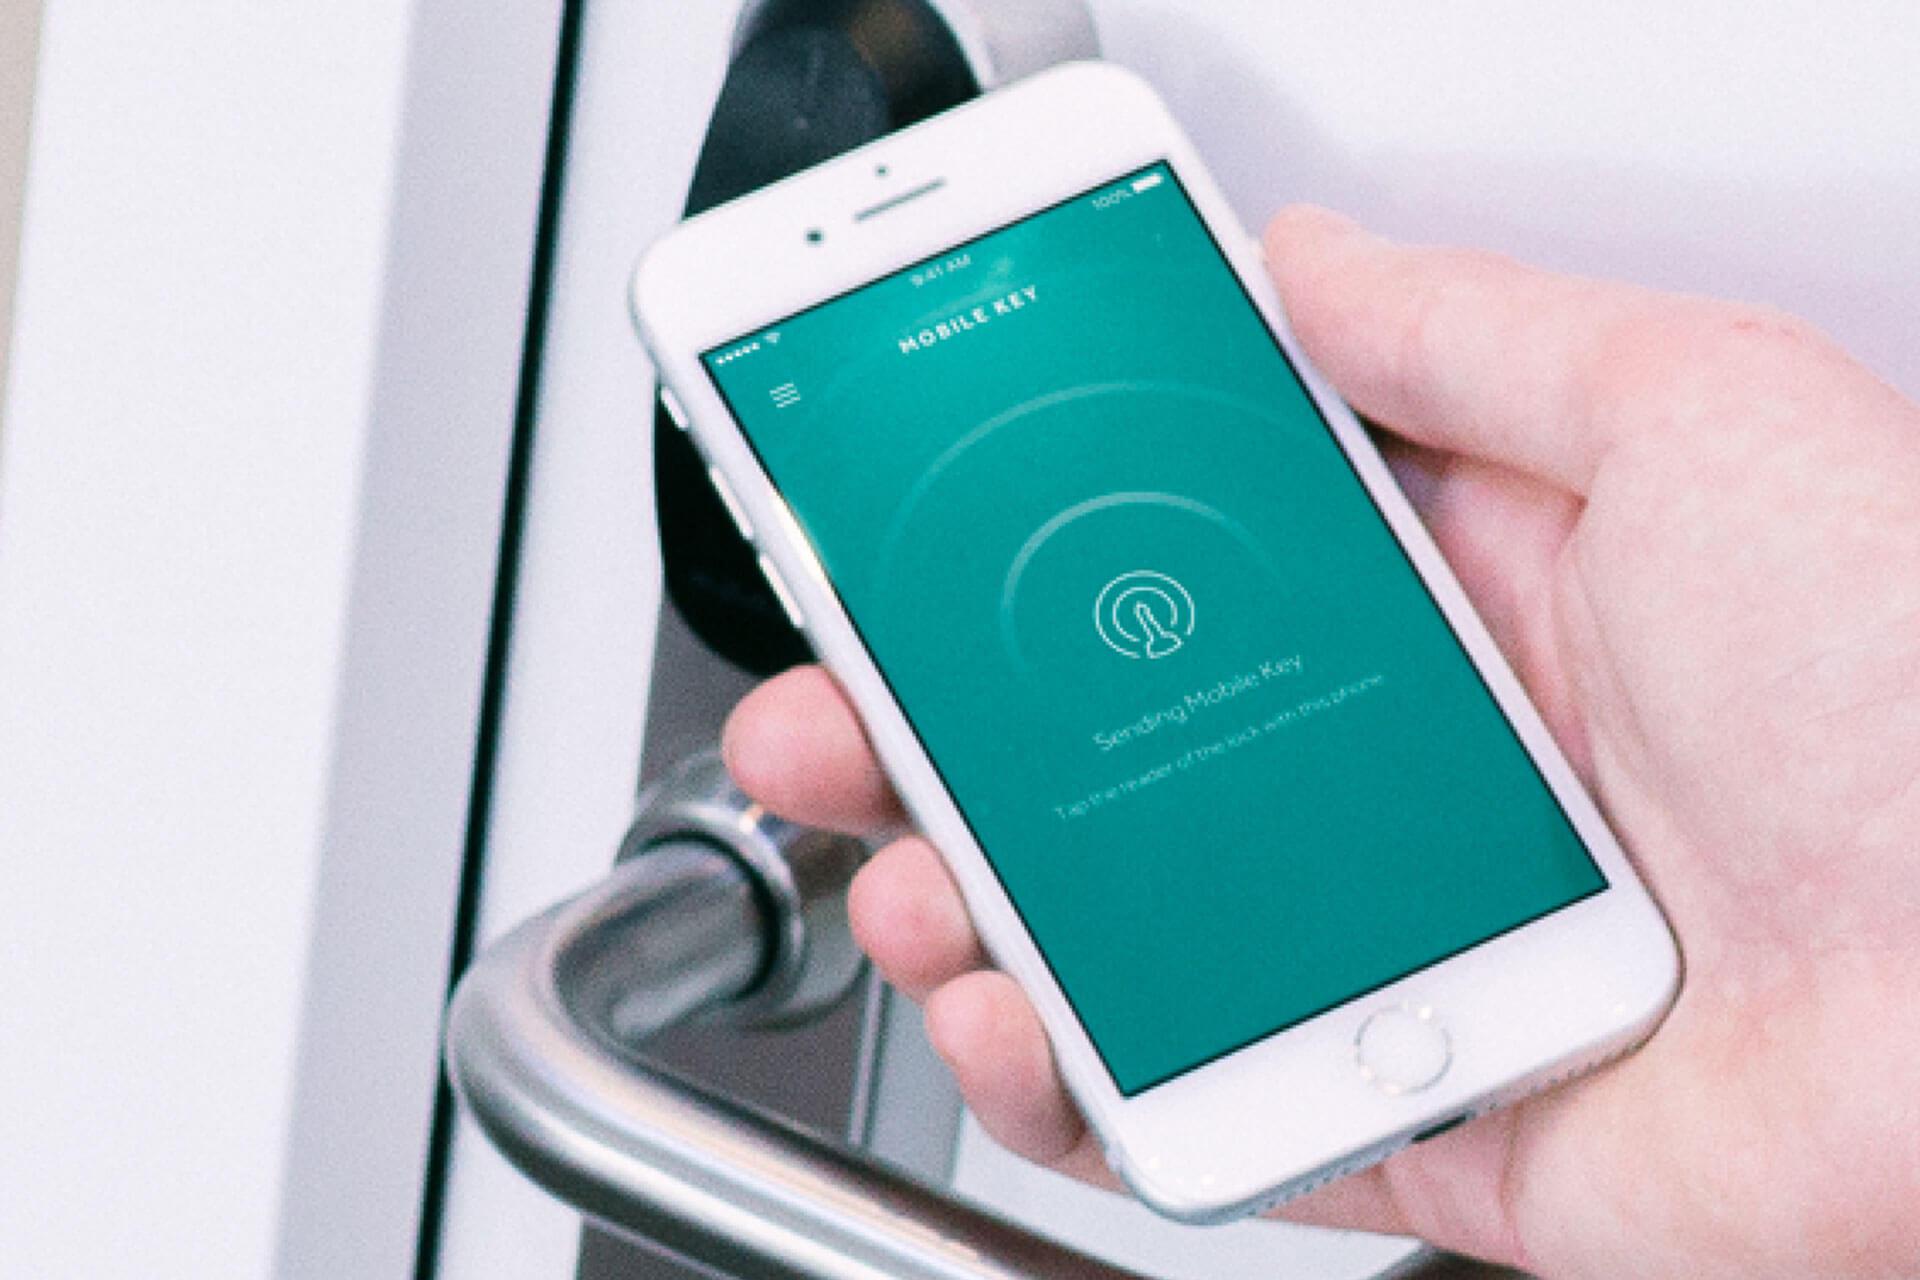 Toegangscontrole via Smartphone